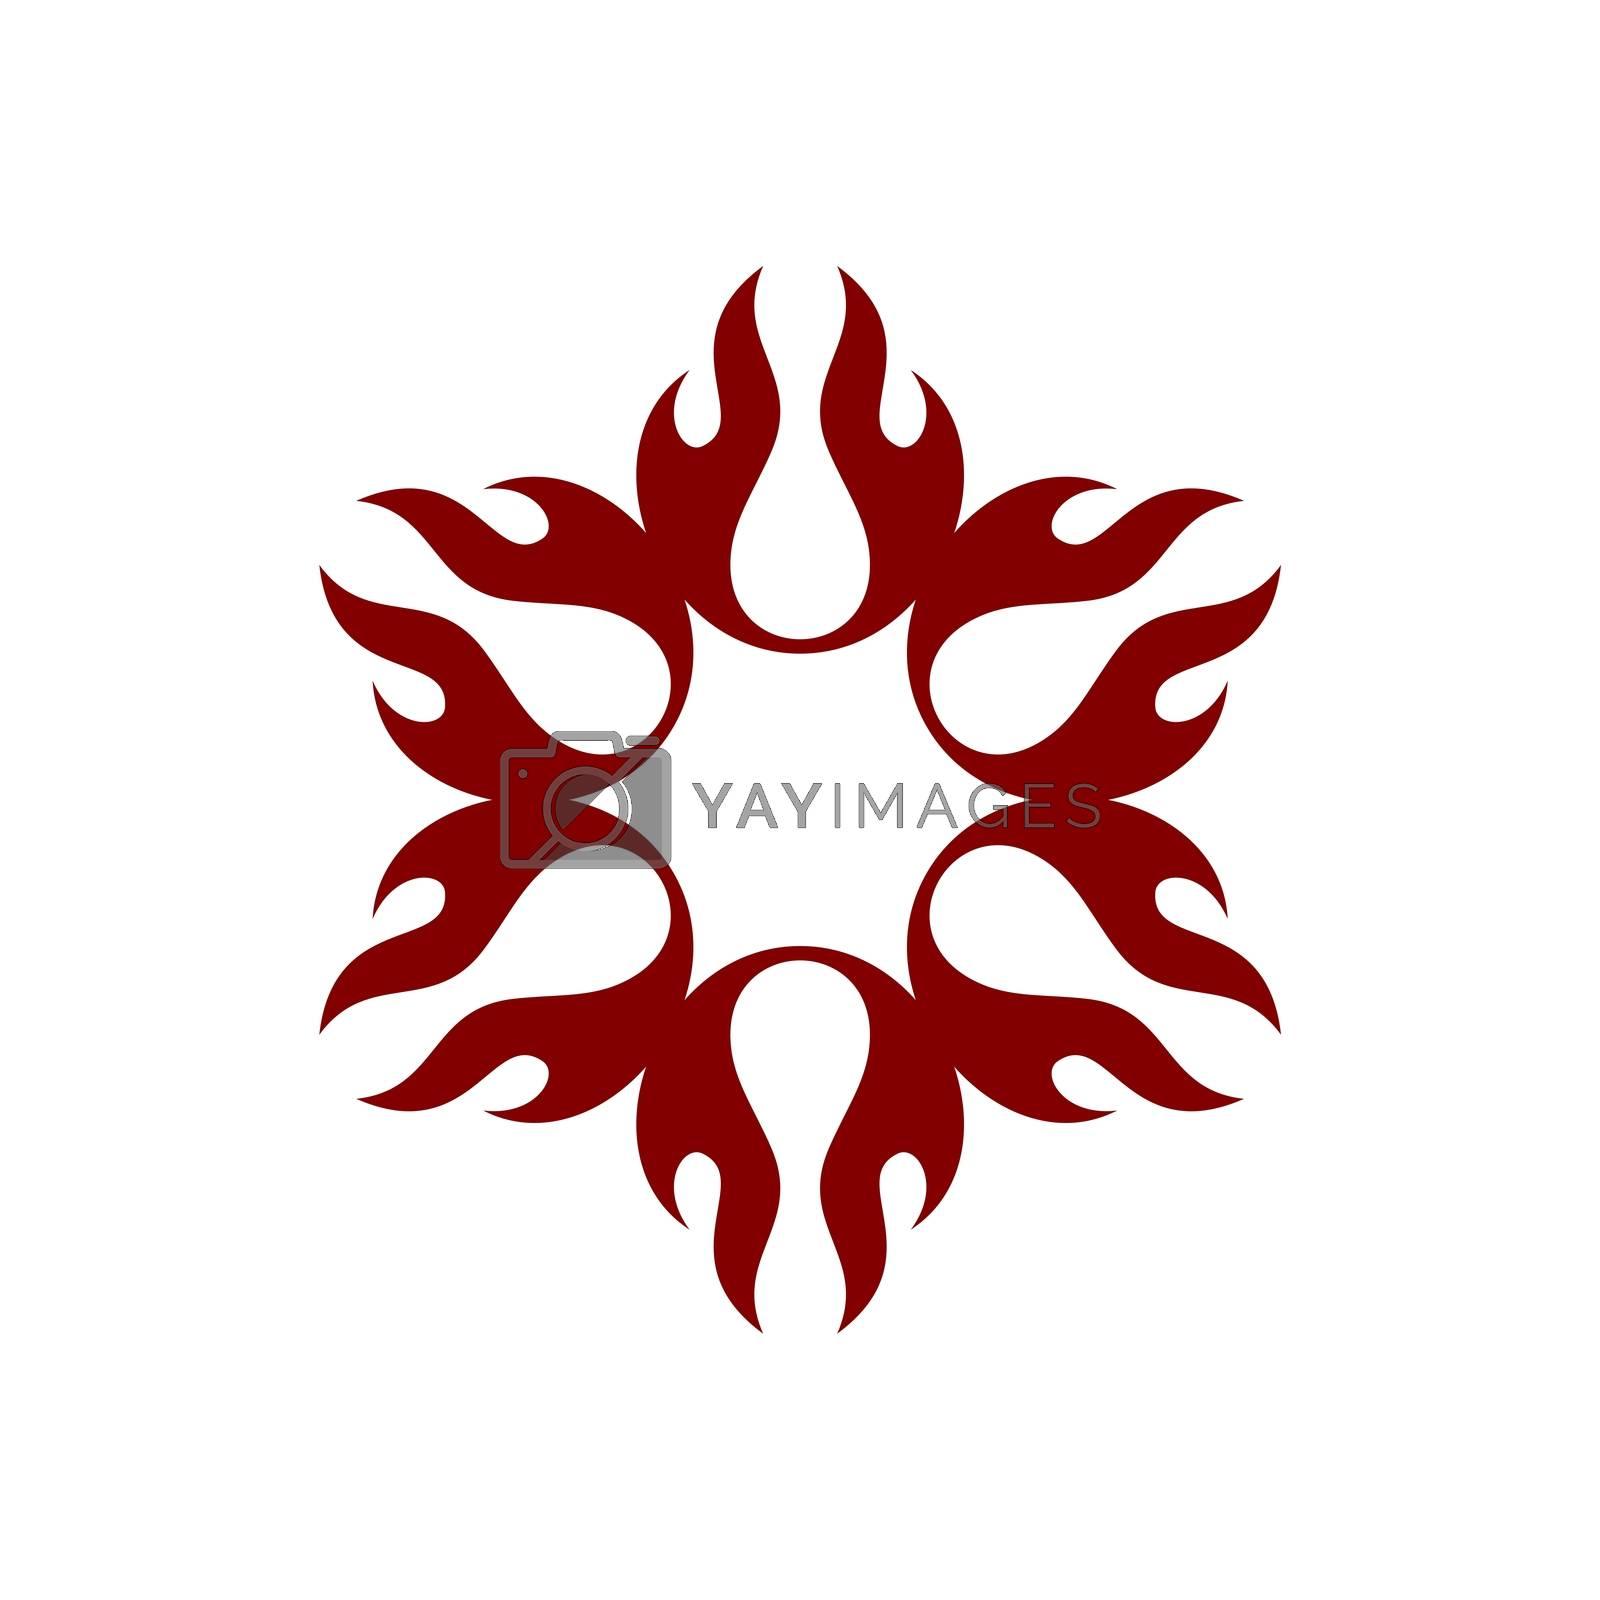 Red Flame Fire Flower Logo Template Illustration Design. Vector EPS 10.